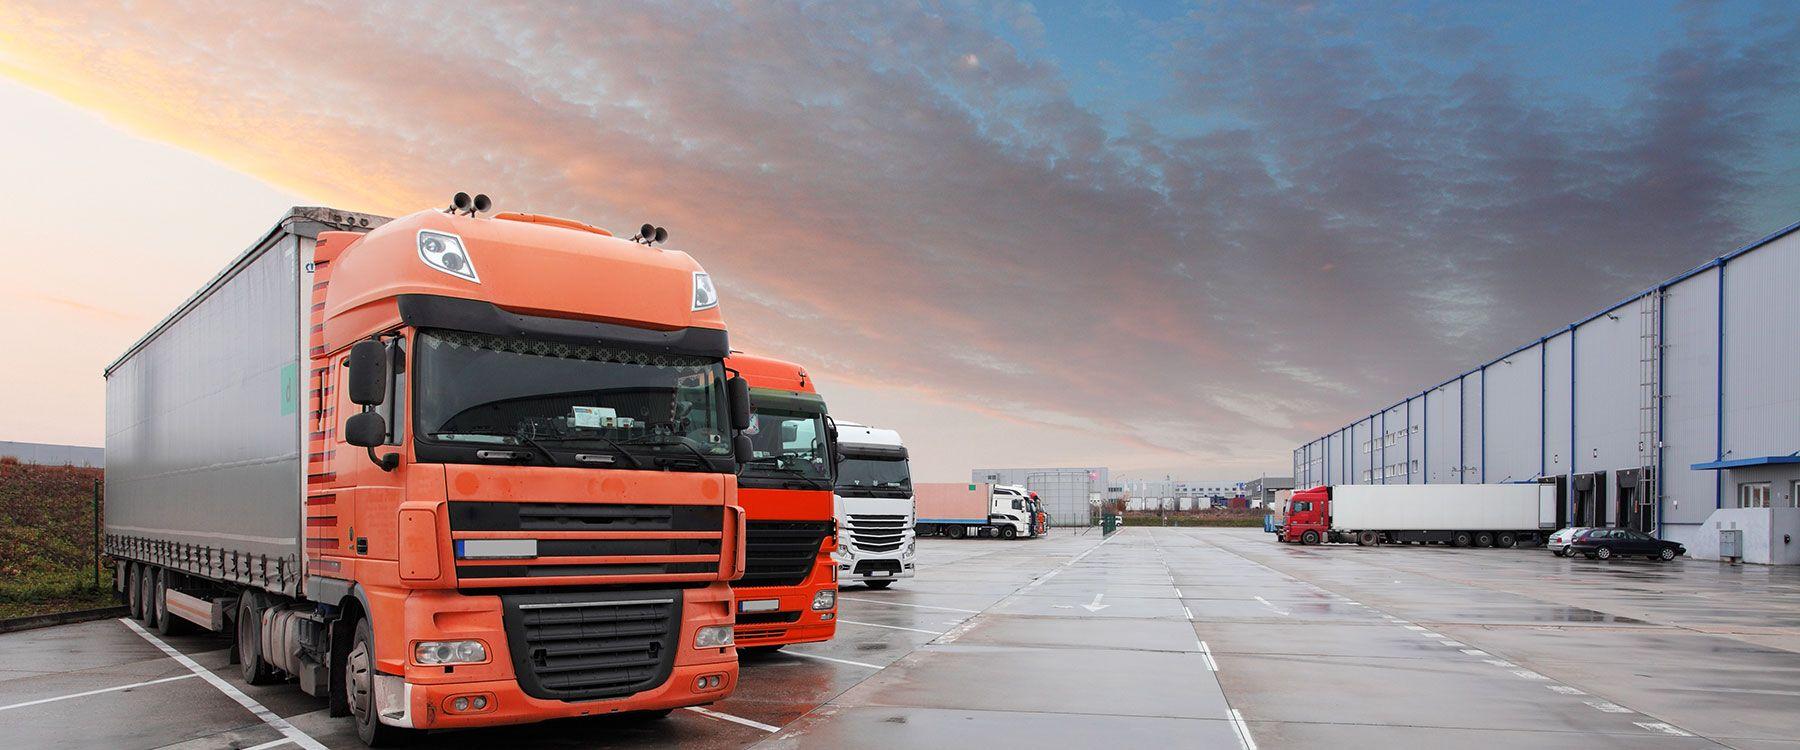 Cargo_giants international provides innovative logistics